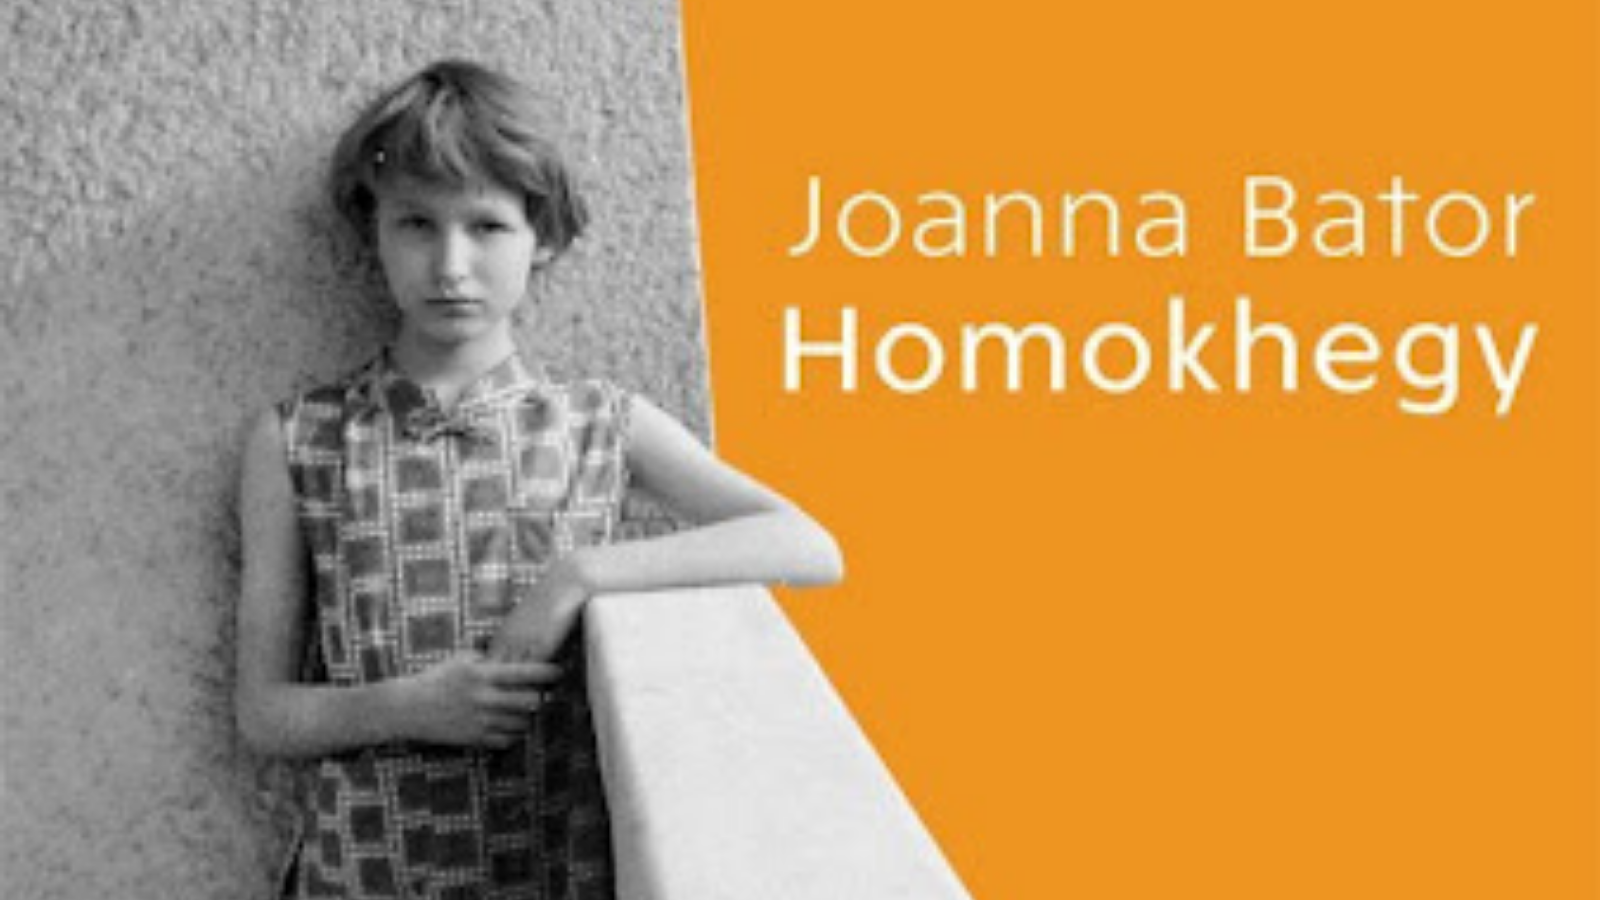 Panelnihil (Joanna Bator: Homokhegy)